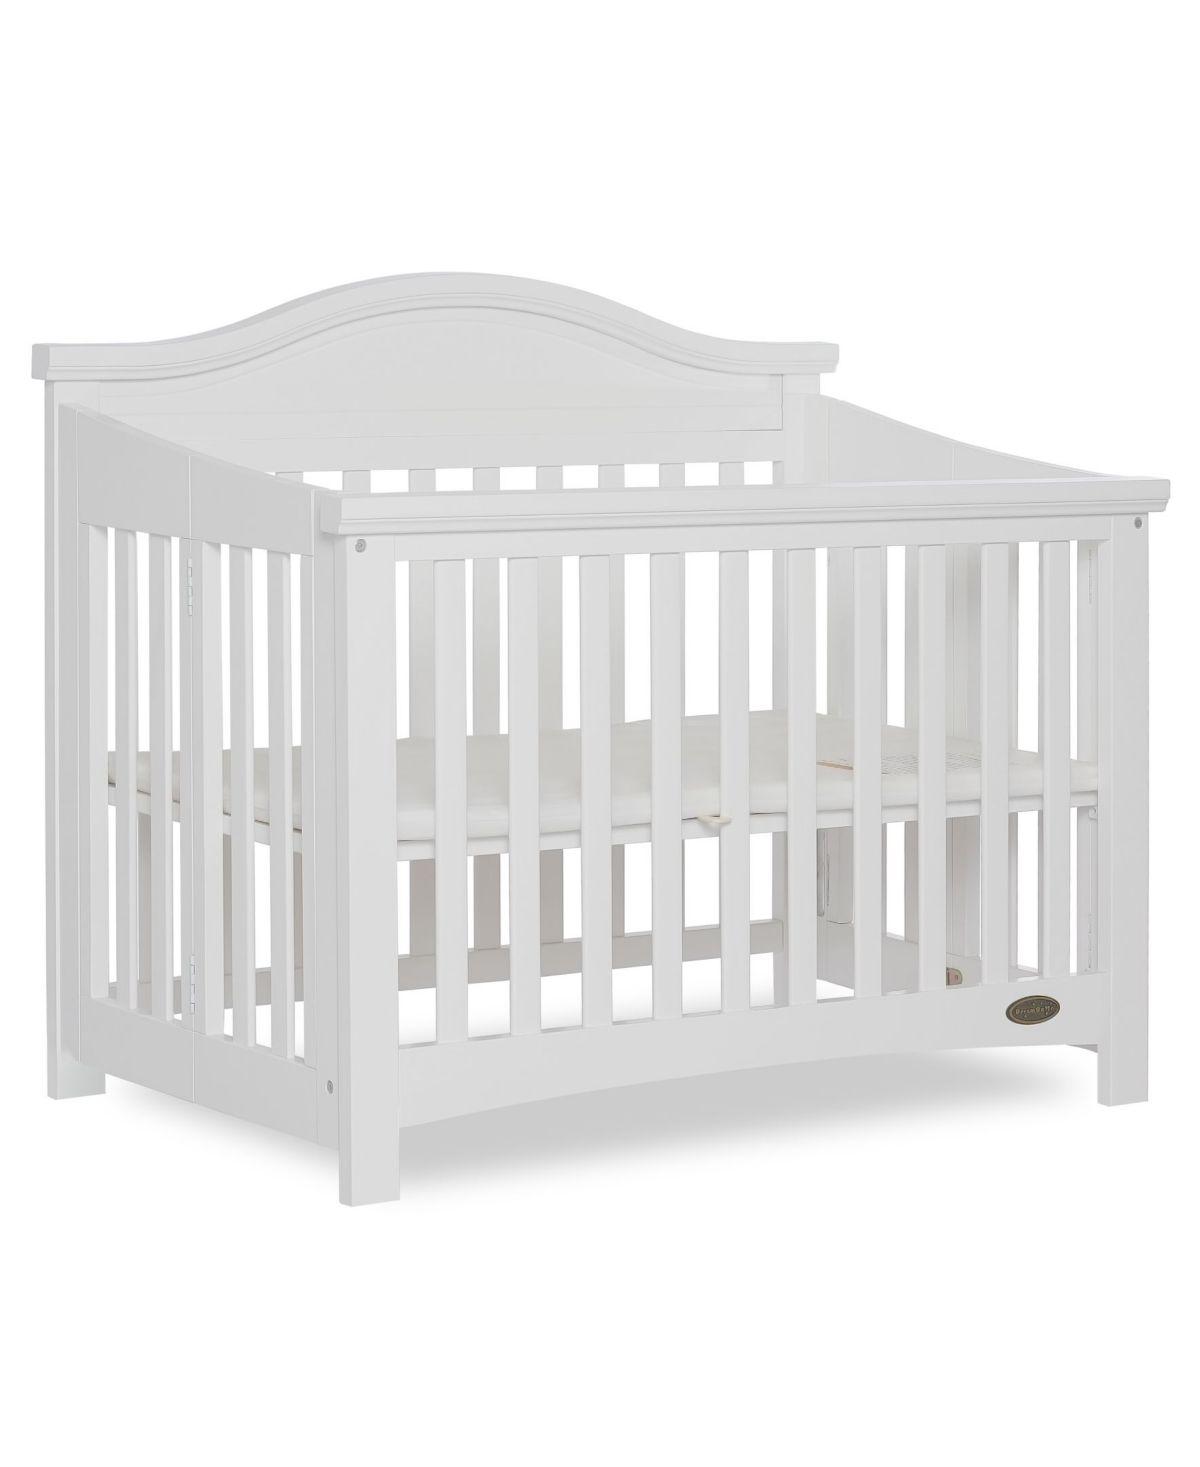 Dream On Me Folding Portable Crib White Portable Crib Cribs